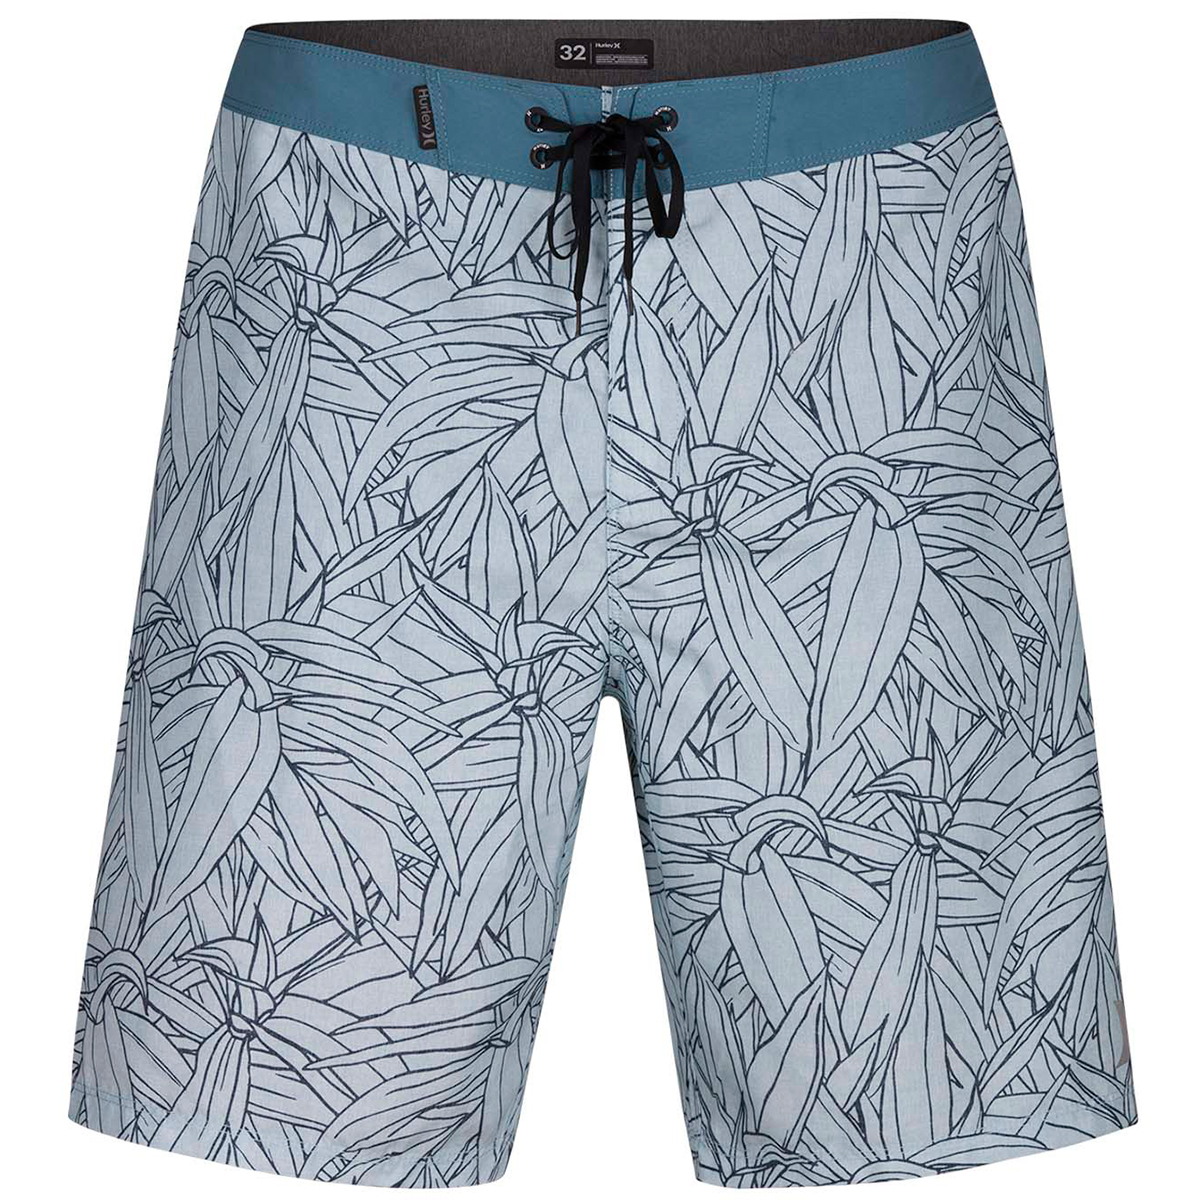 Hurley Guys' 20 In. Pupukea Boardshorts - Blue, 32